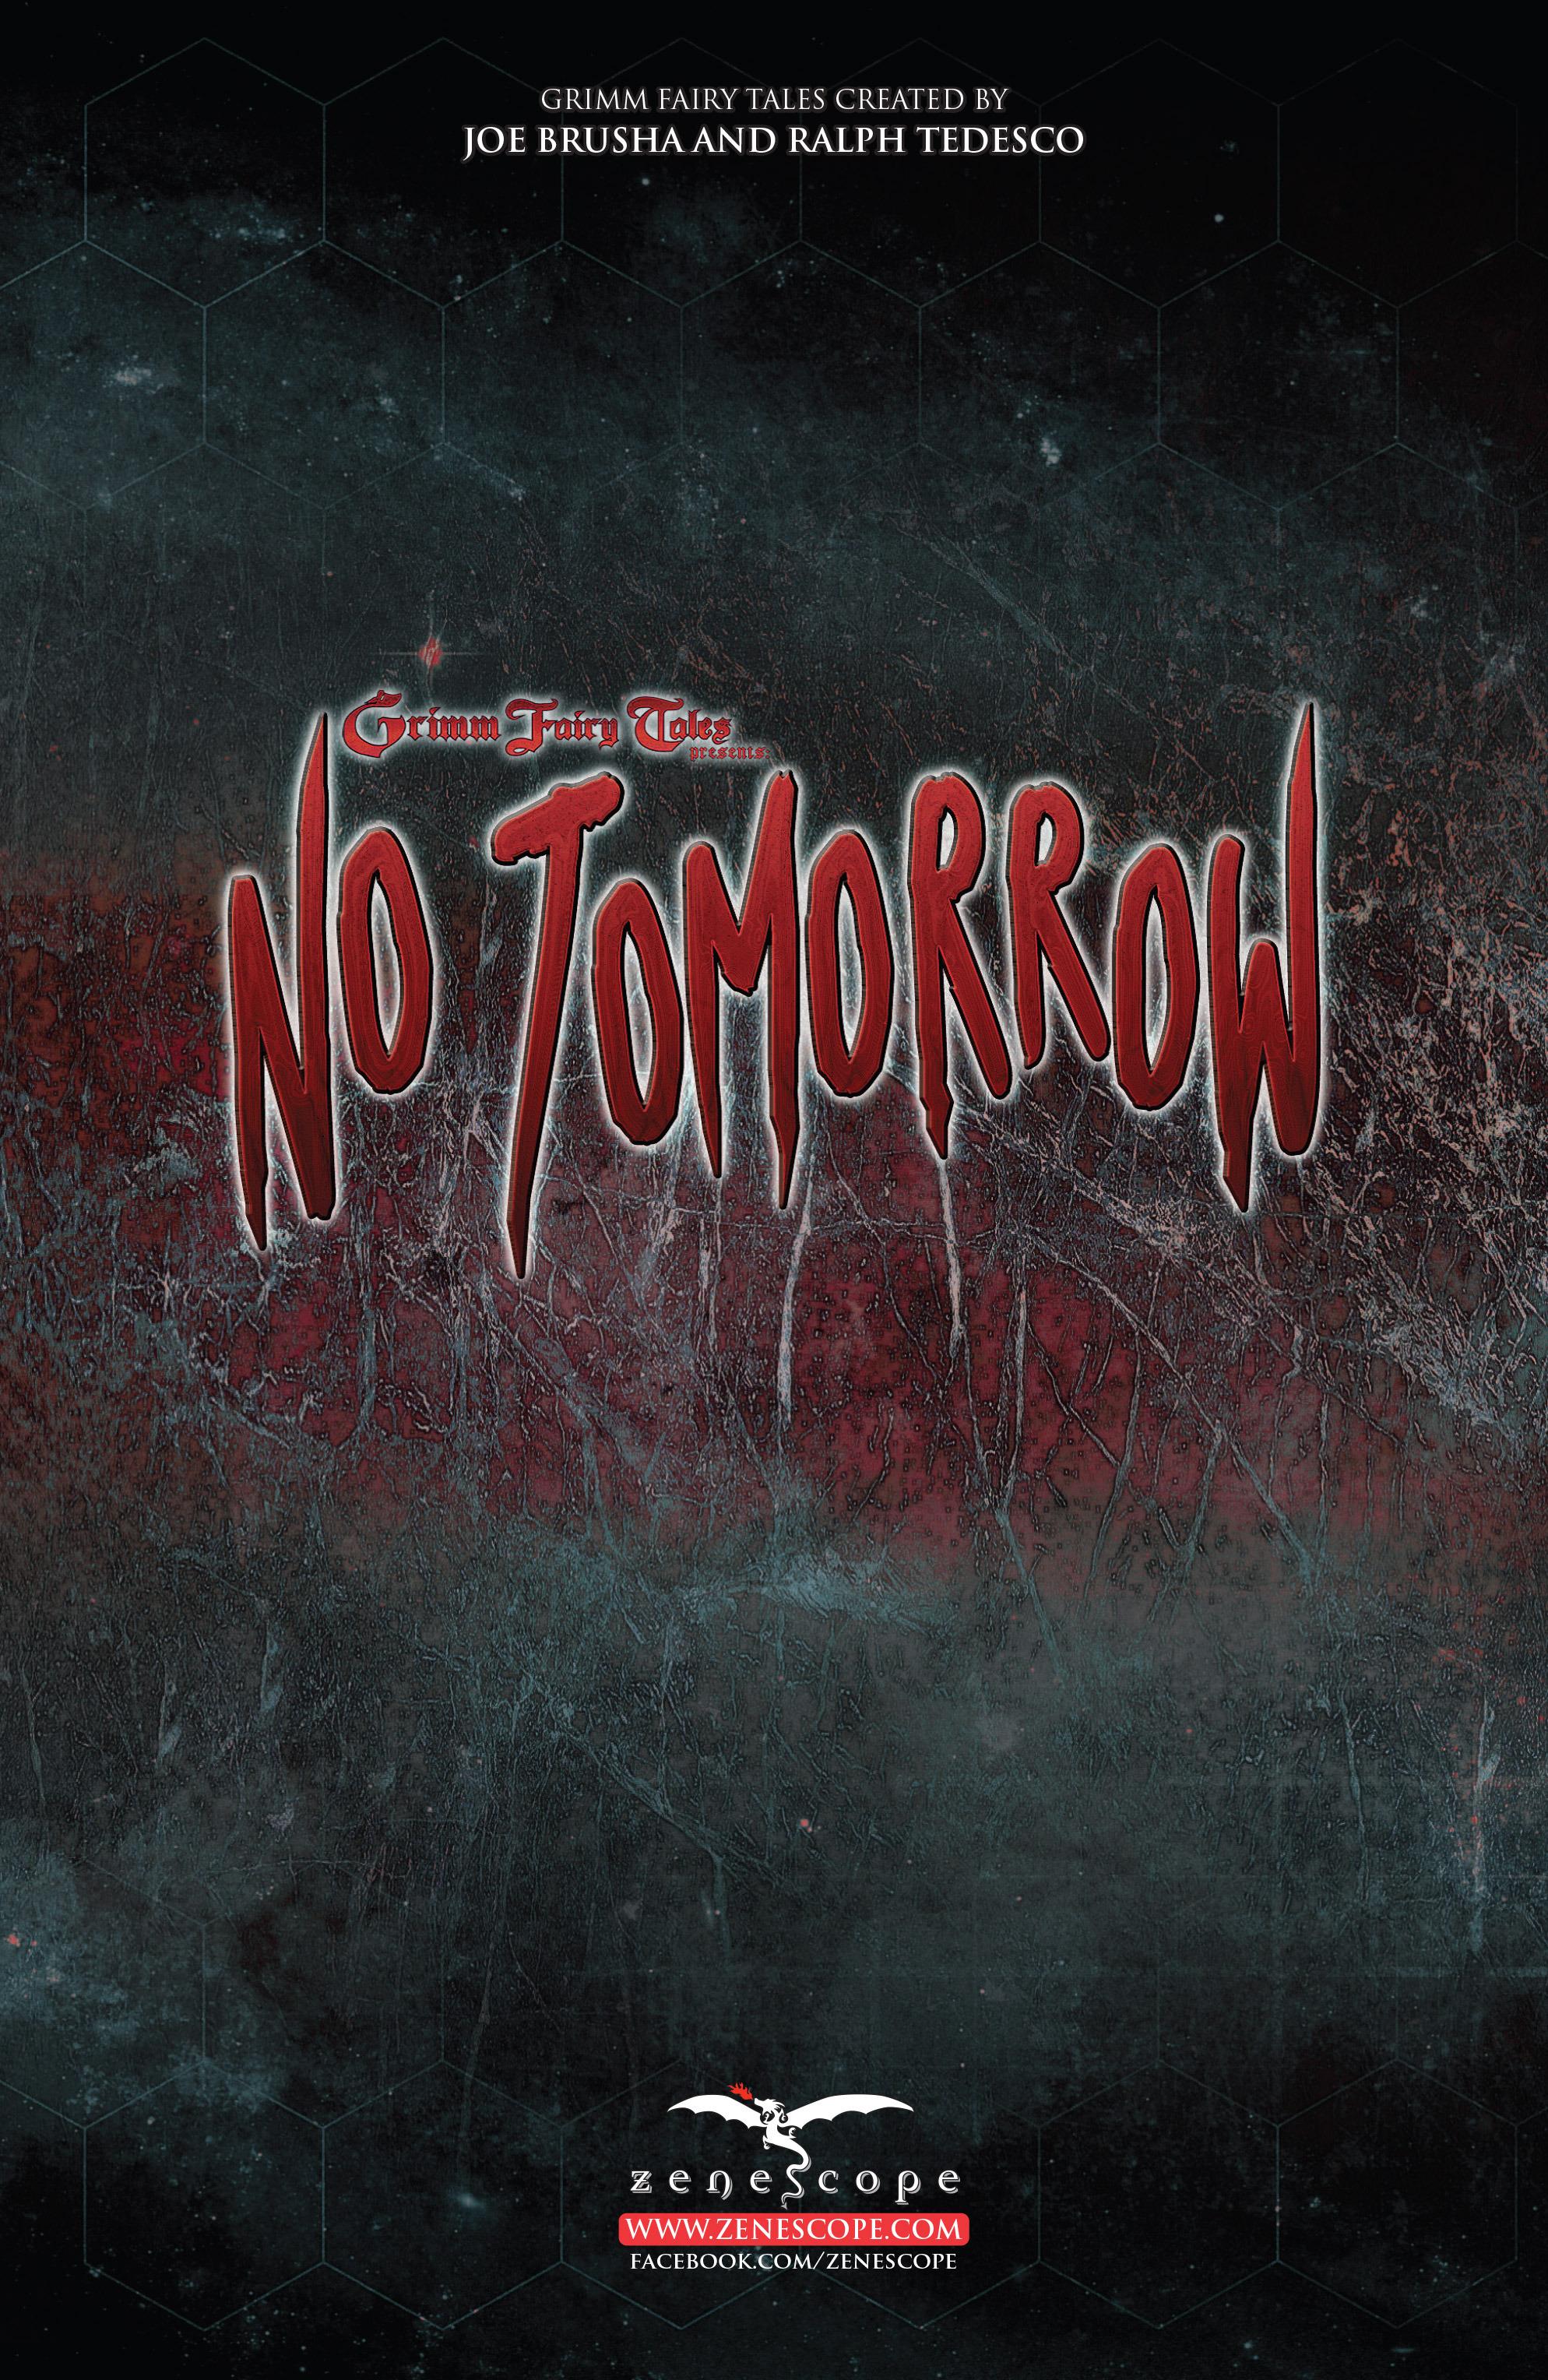 Read online Grimm Fairy Tales presents No Tomorrow comic -  Issue # TPB - 2